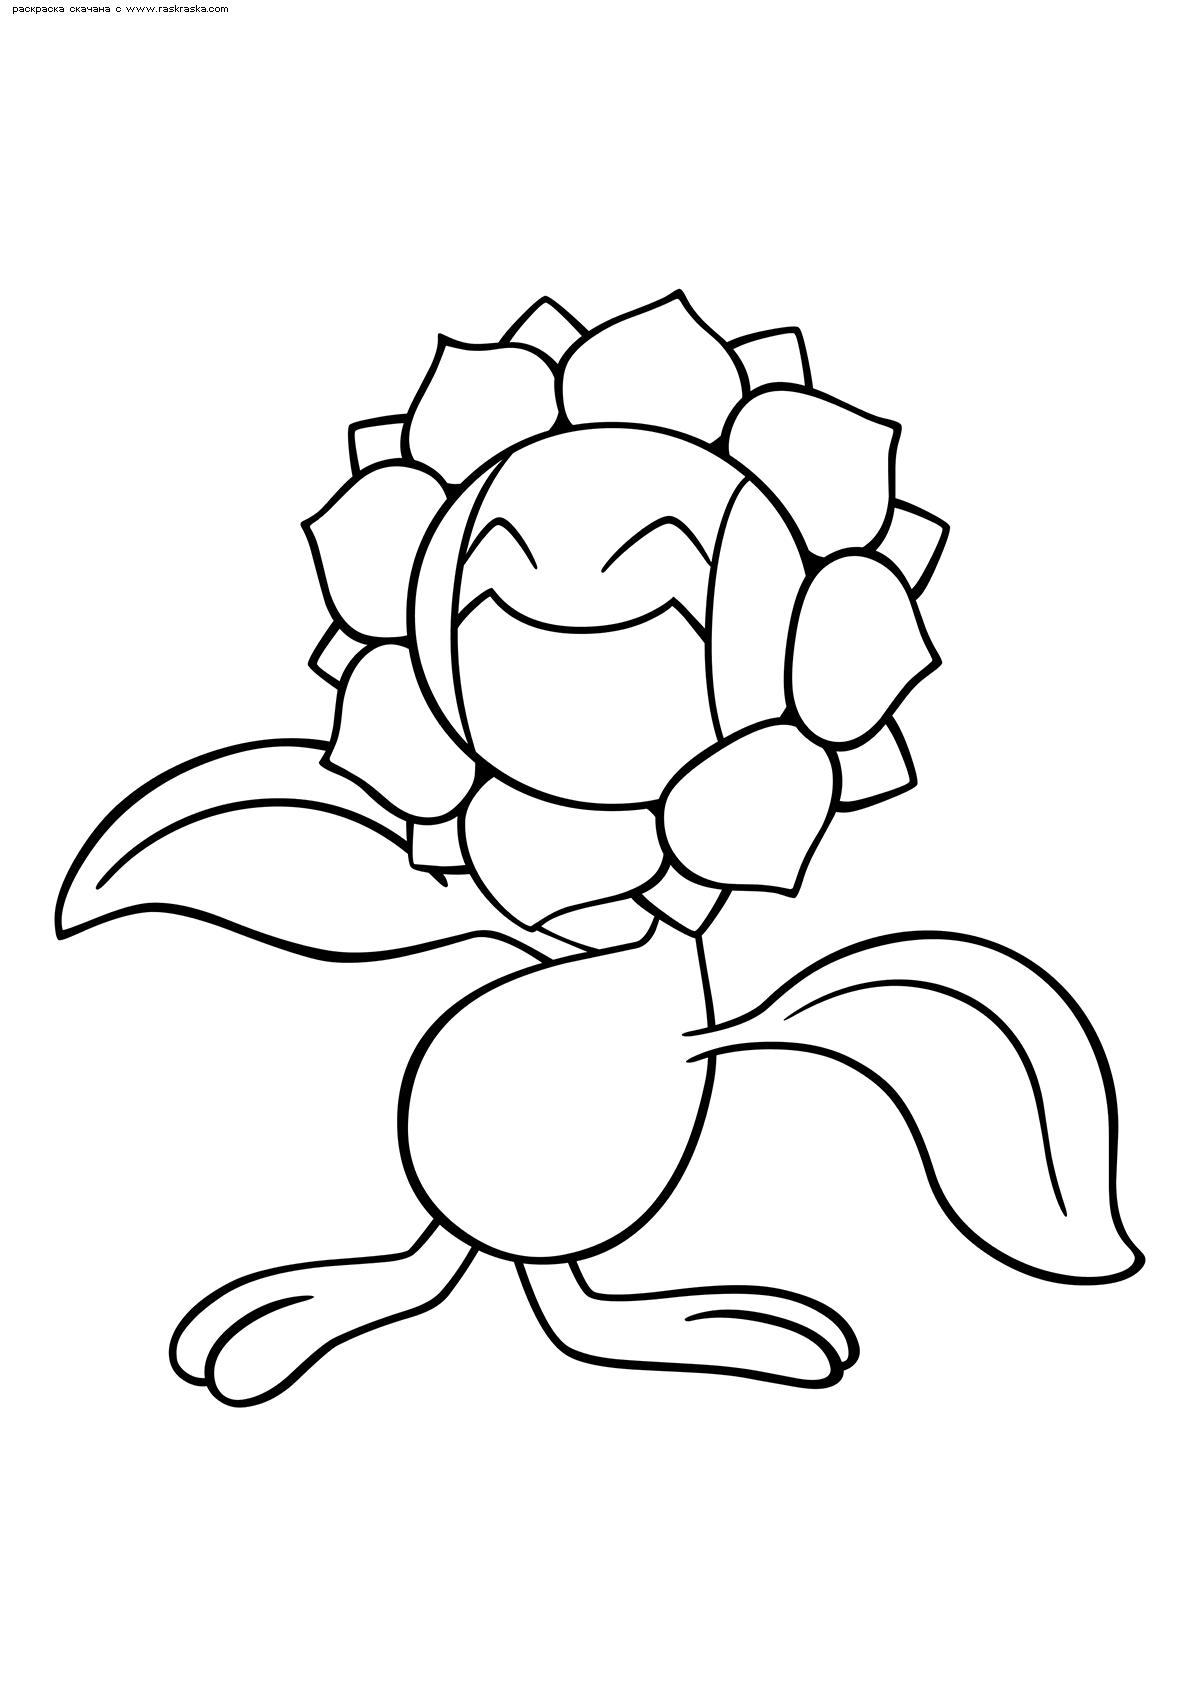 Раскраска Покемон Санфлора (Sunflora) | Раскраски эволюция ...